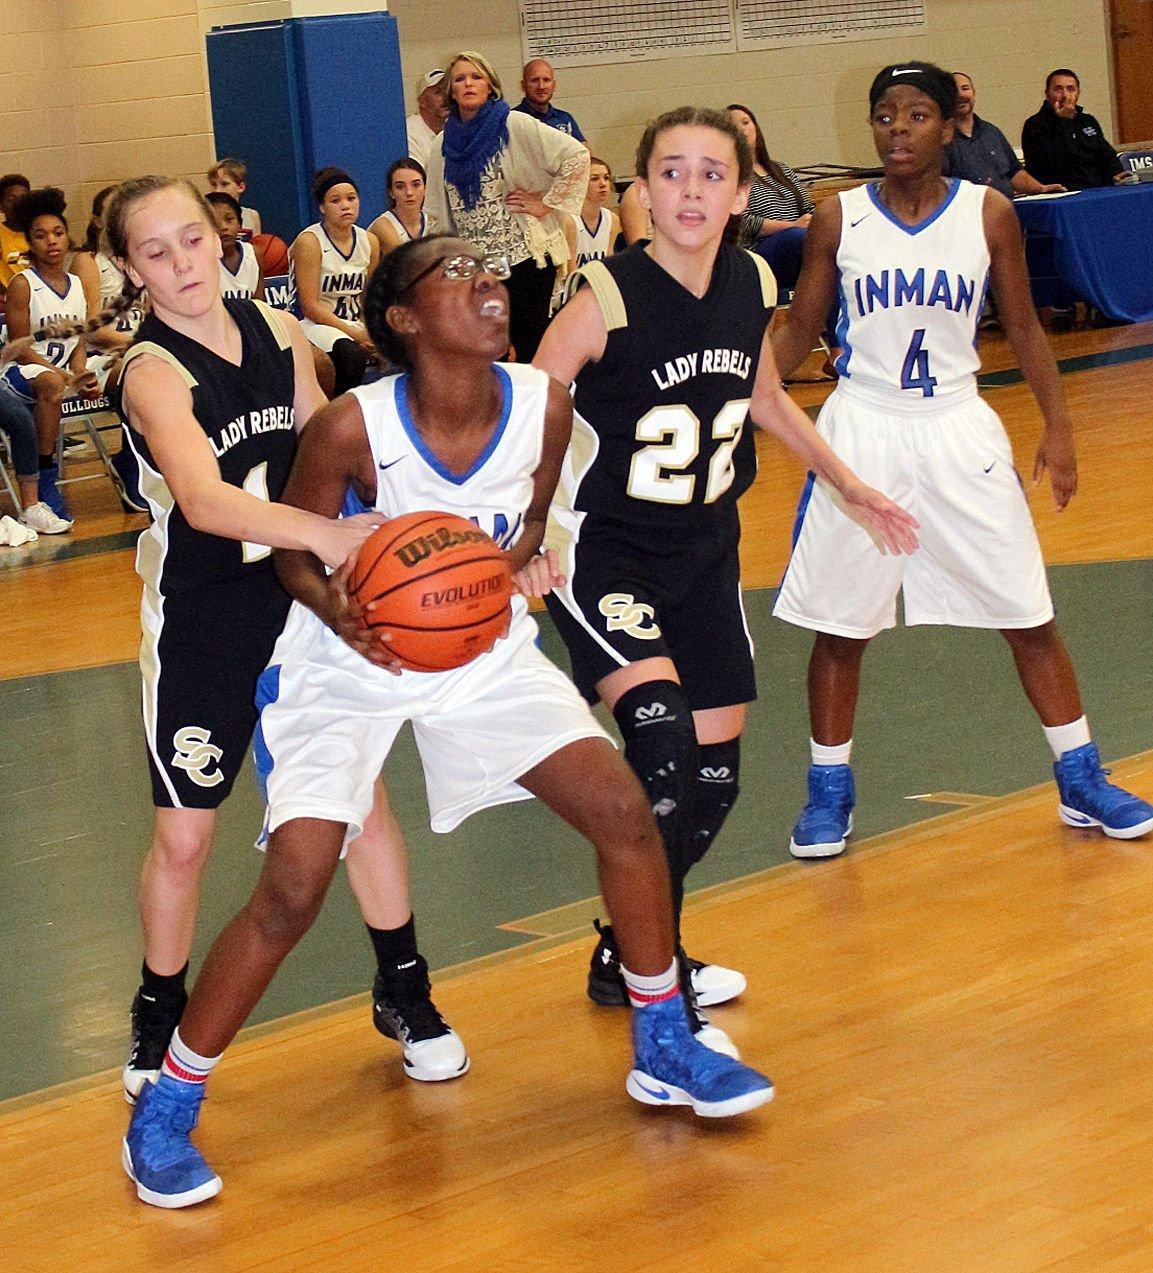 Colorado Shooting Middle School: Inman Basketball Teams Claim Wins Over Dresden